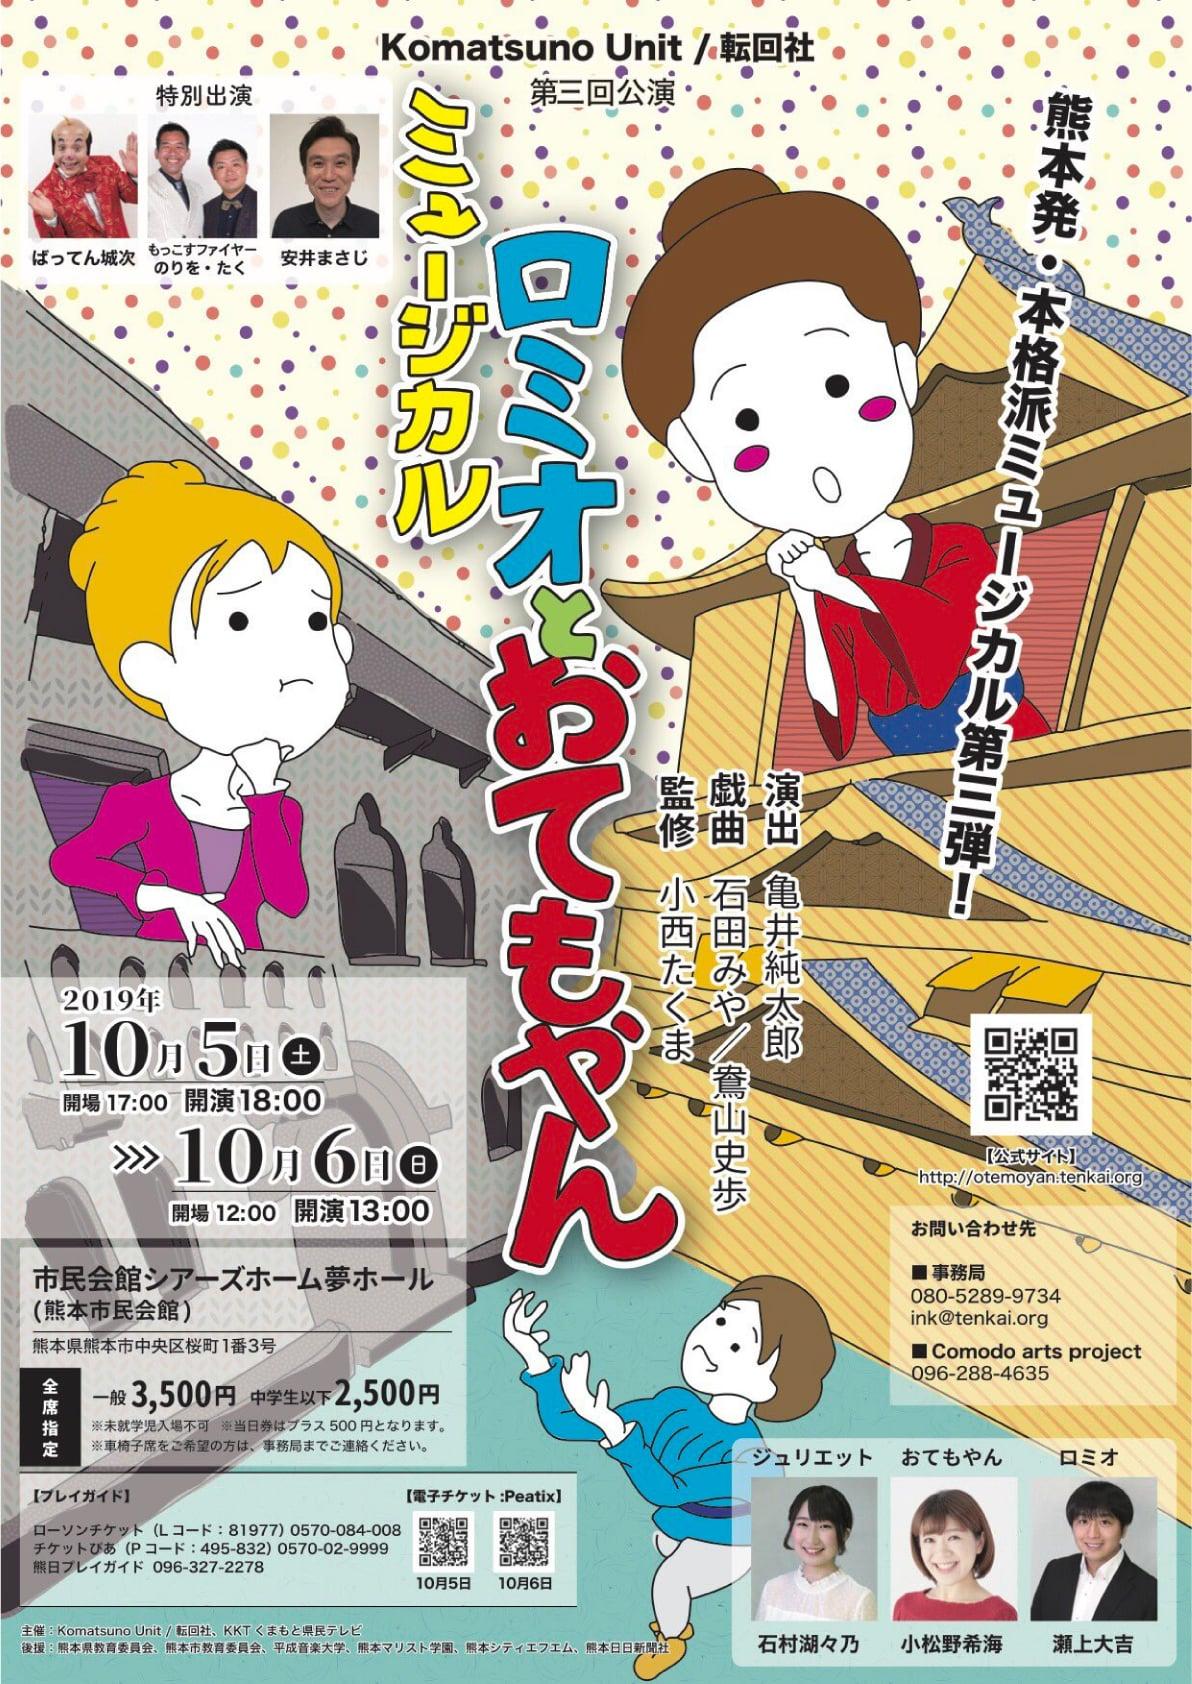 Komatsuno Unit / 転回社『ミュージカル ロミオとおてもやん』チラシ1